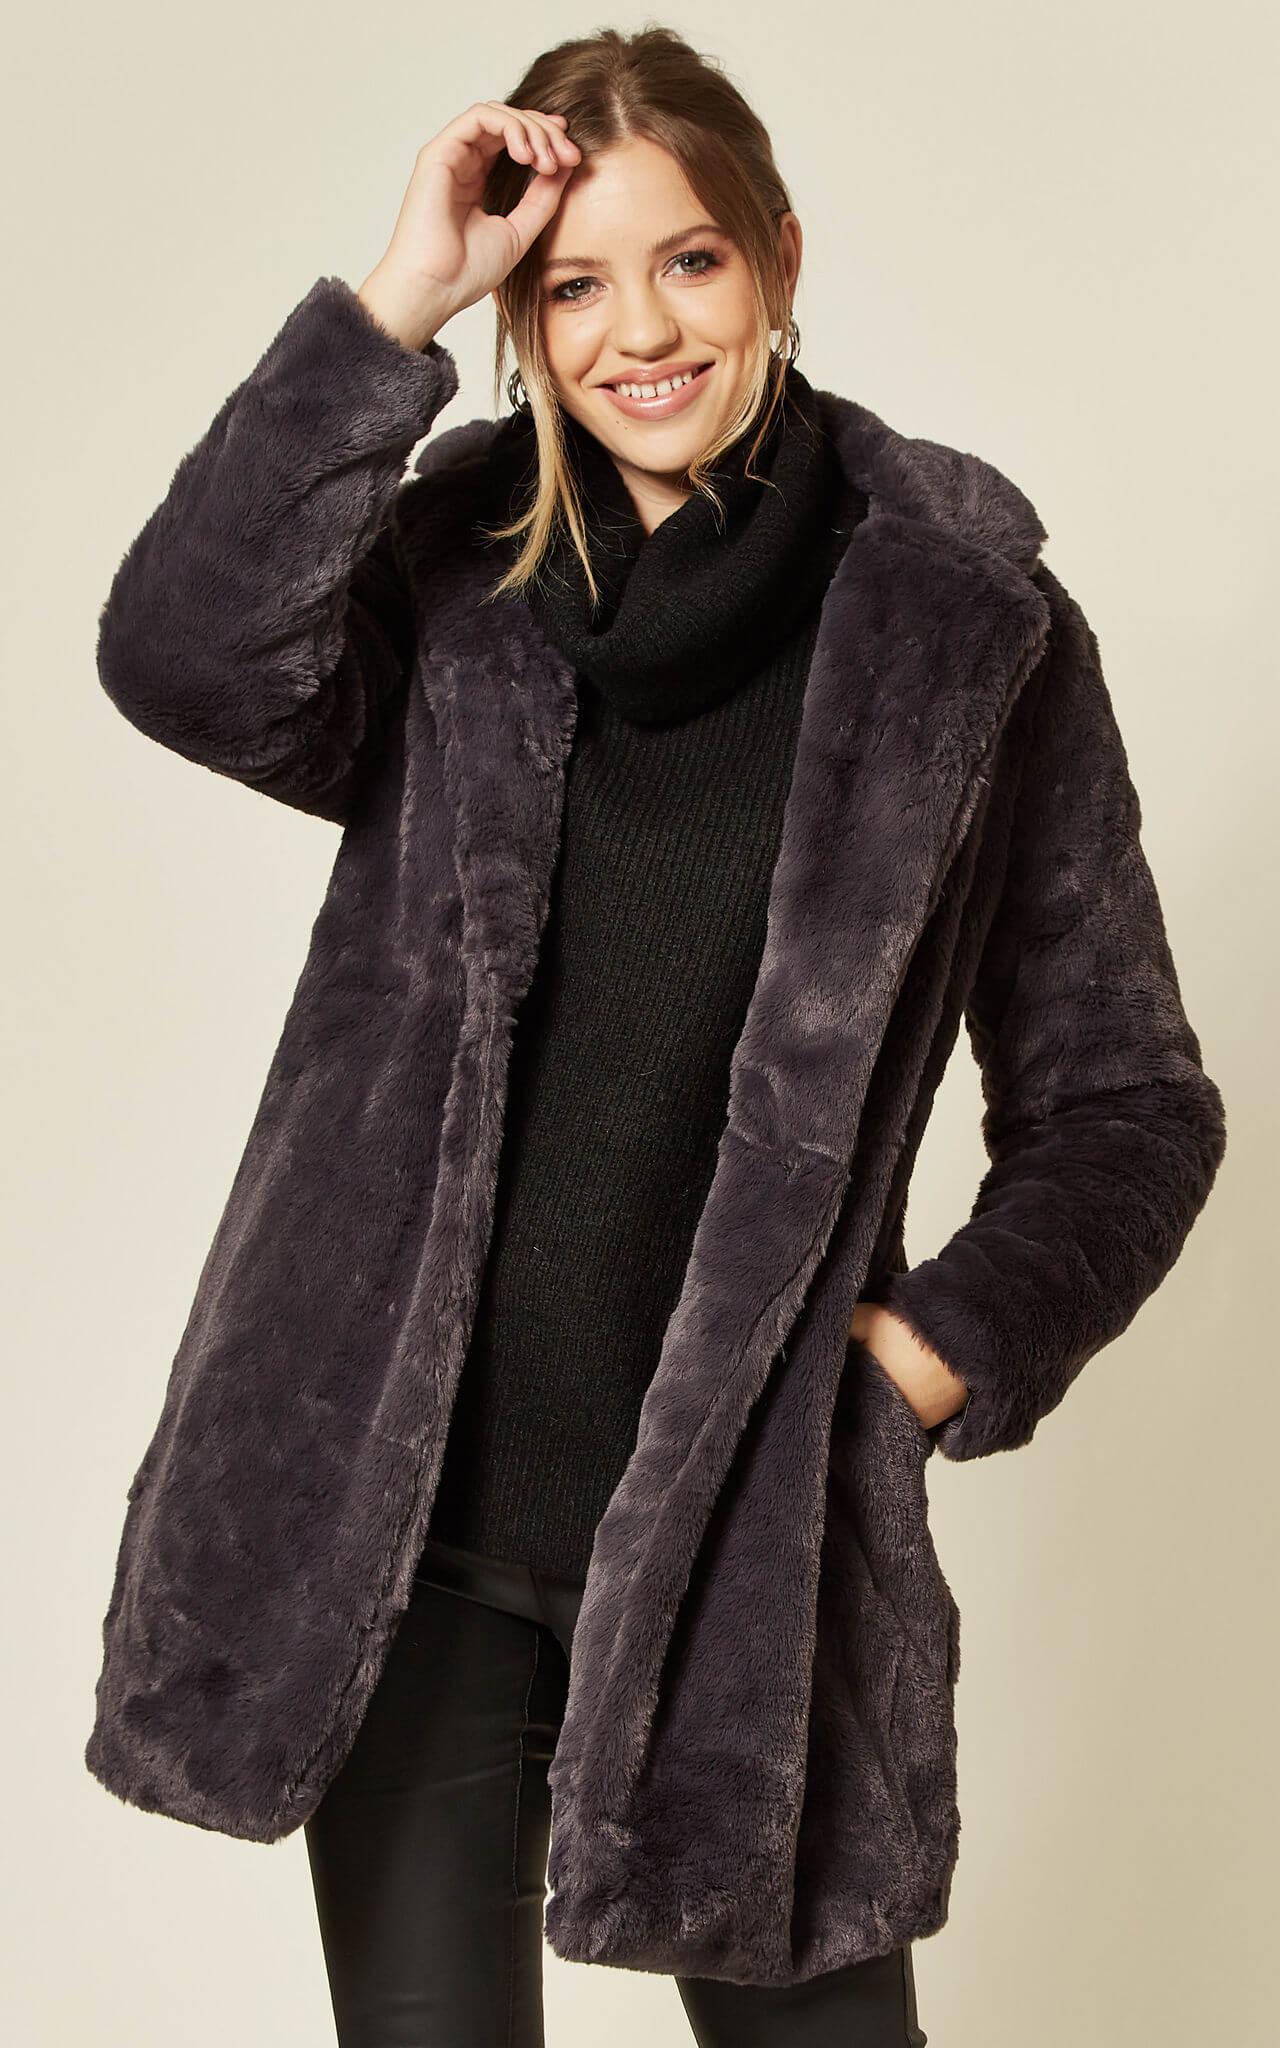 Model wears grey collar fur jacket